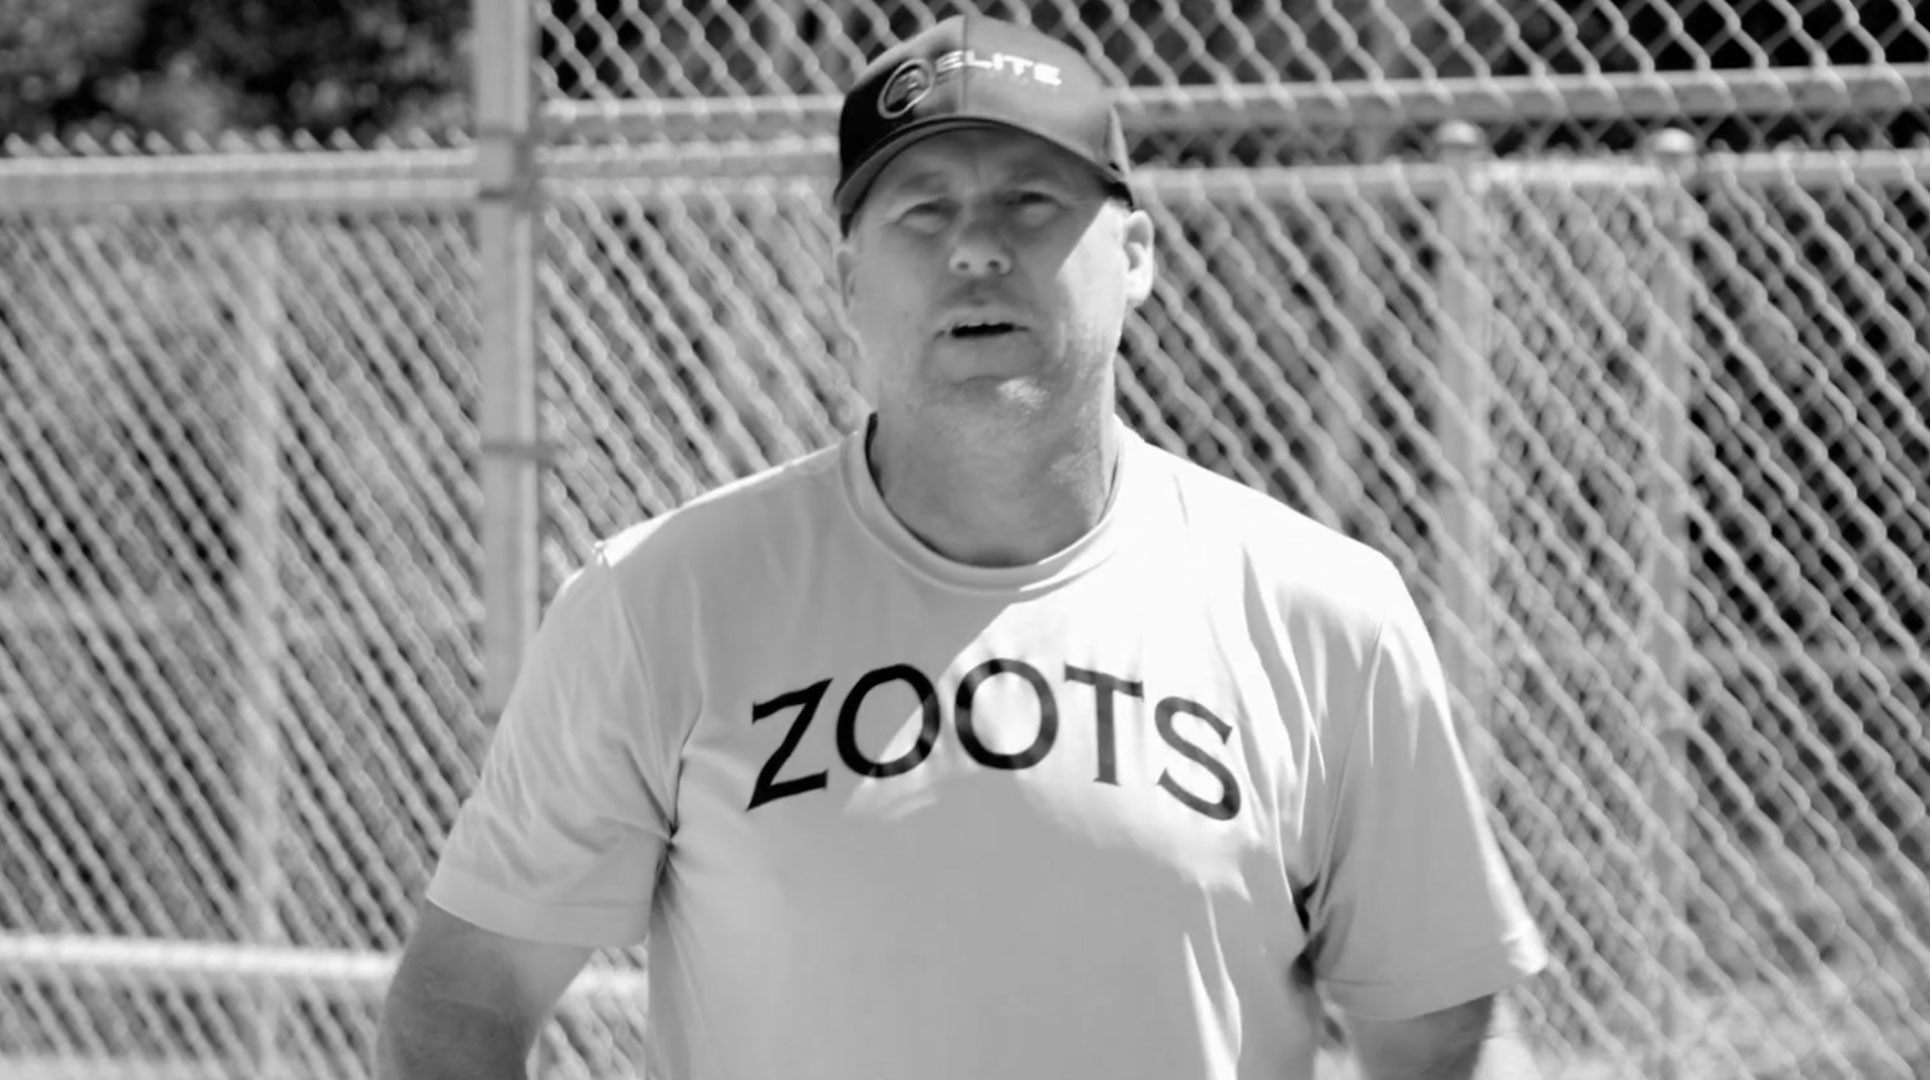 Coach John Zuber